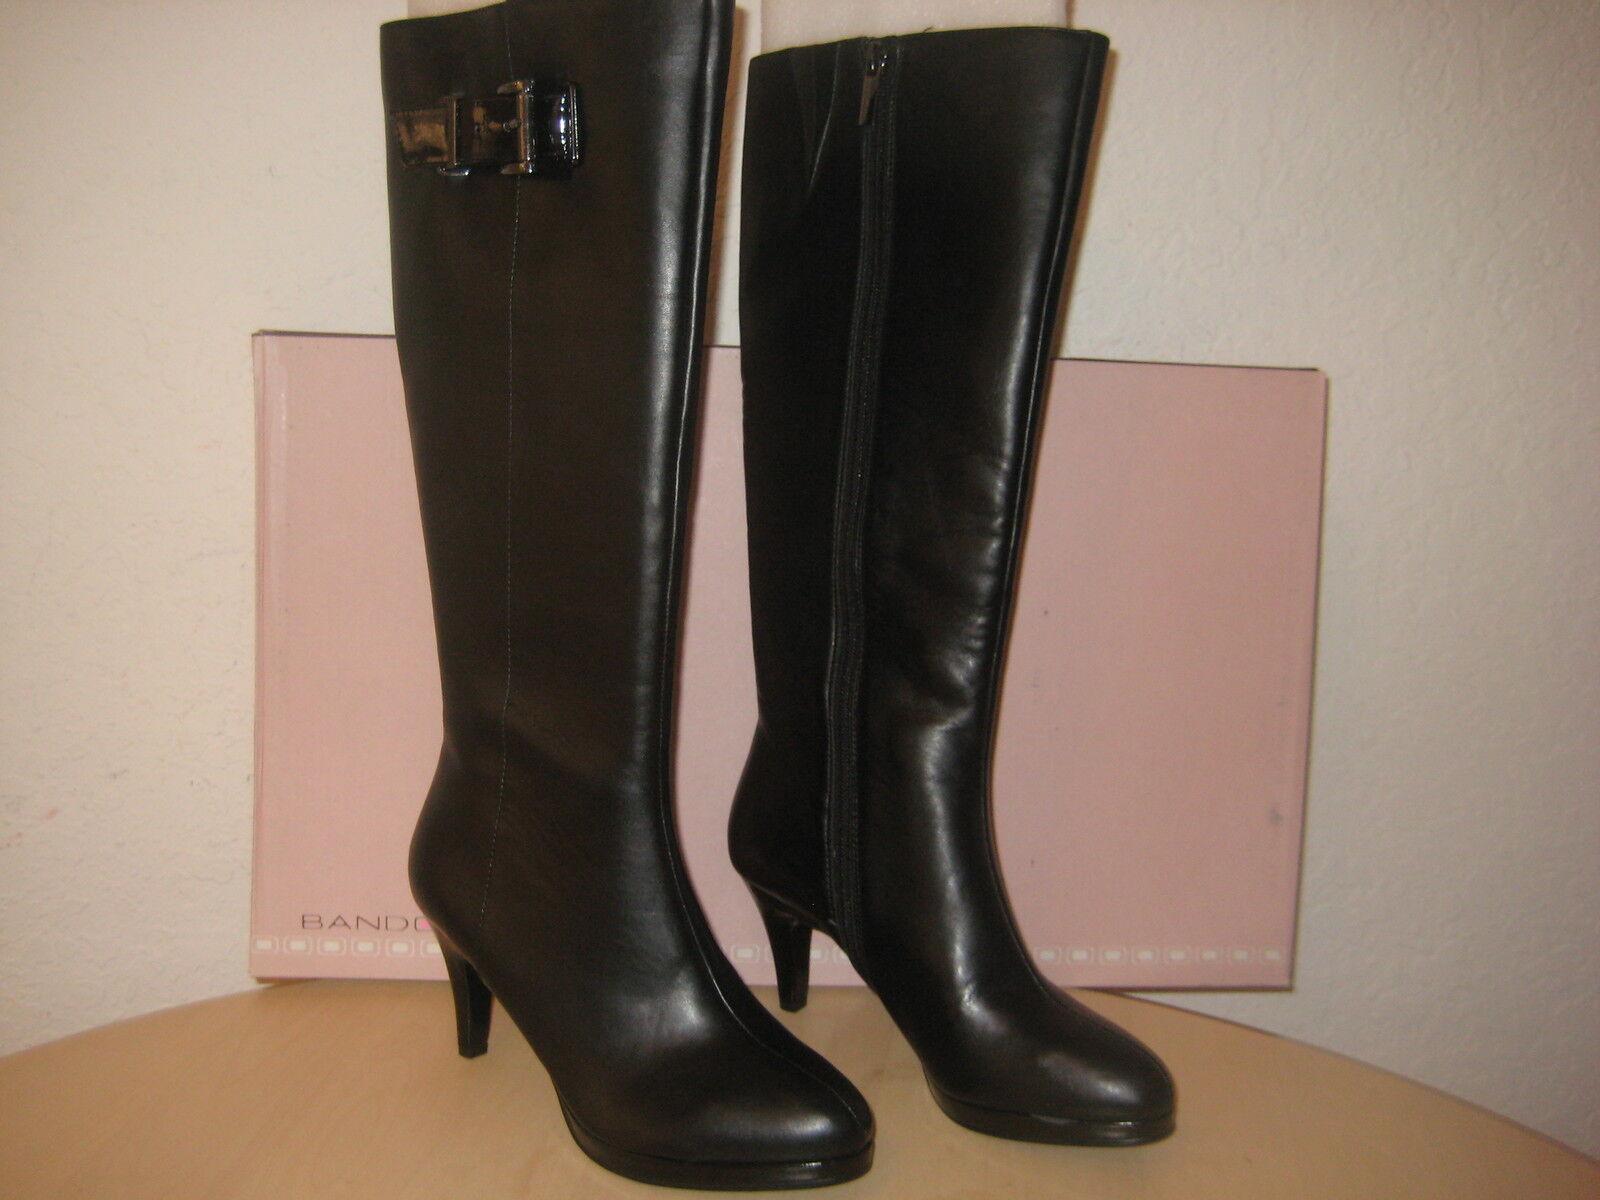 Bandolino Shoes Size 6 M Womens New Jeney Black Knee High Fashion Boots NWB